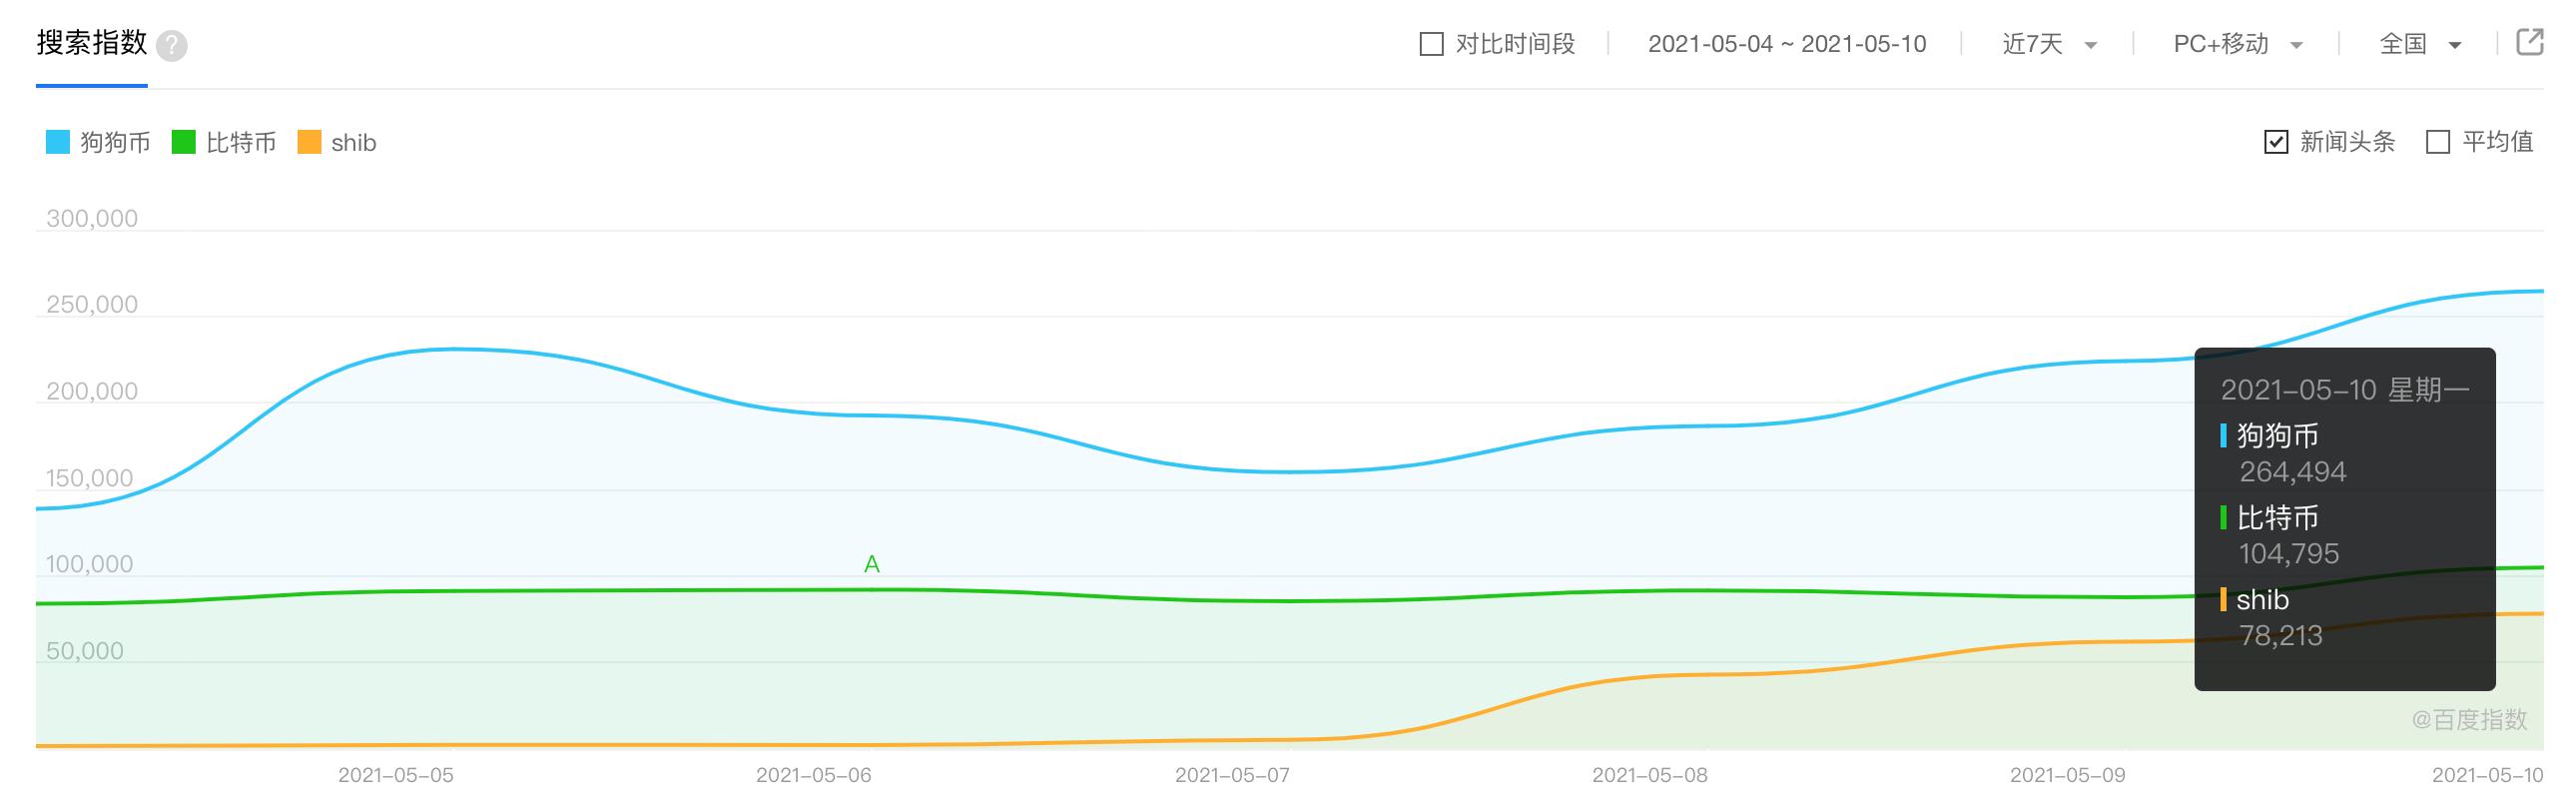 PAData:狗狗币百度指数超比特币创新高,SHIB国内热度远超海外